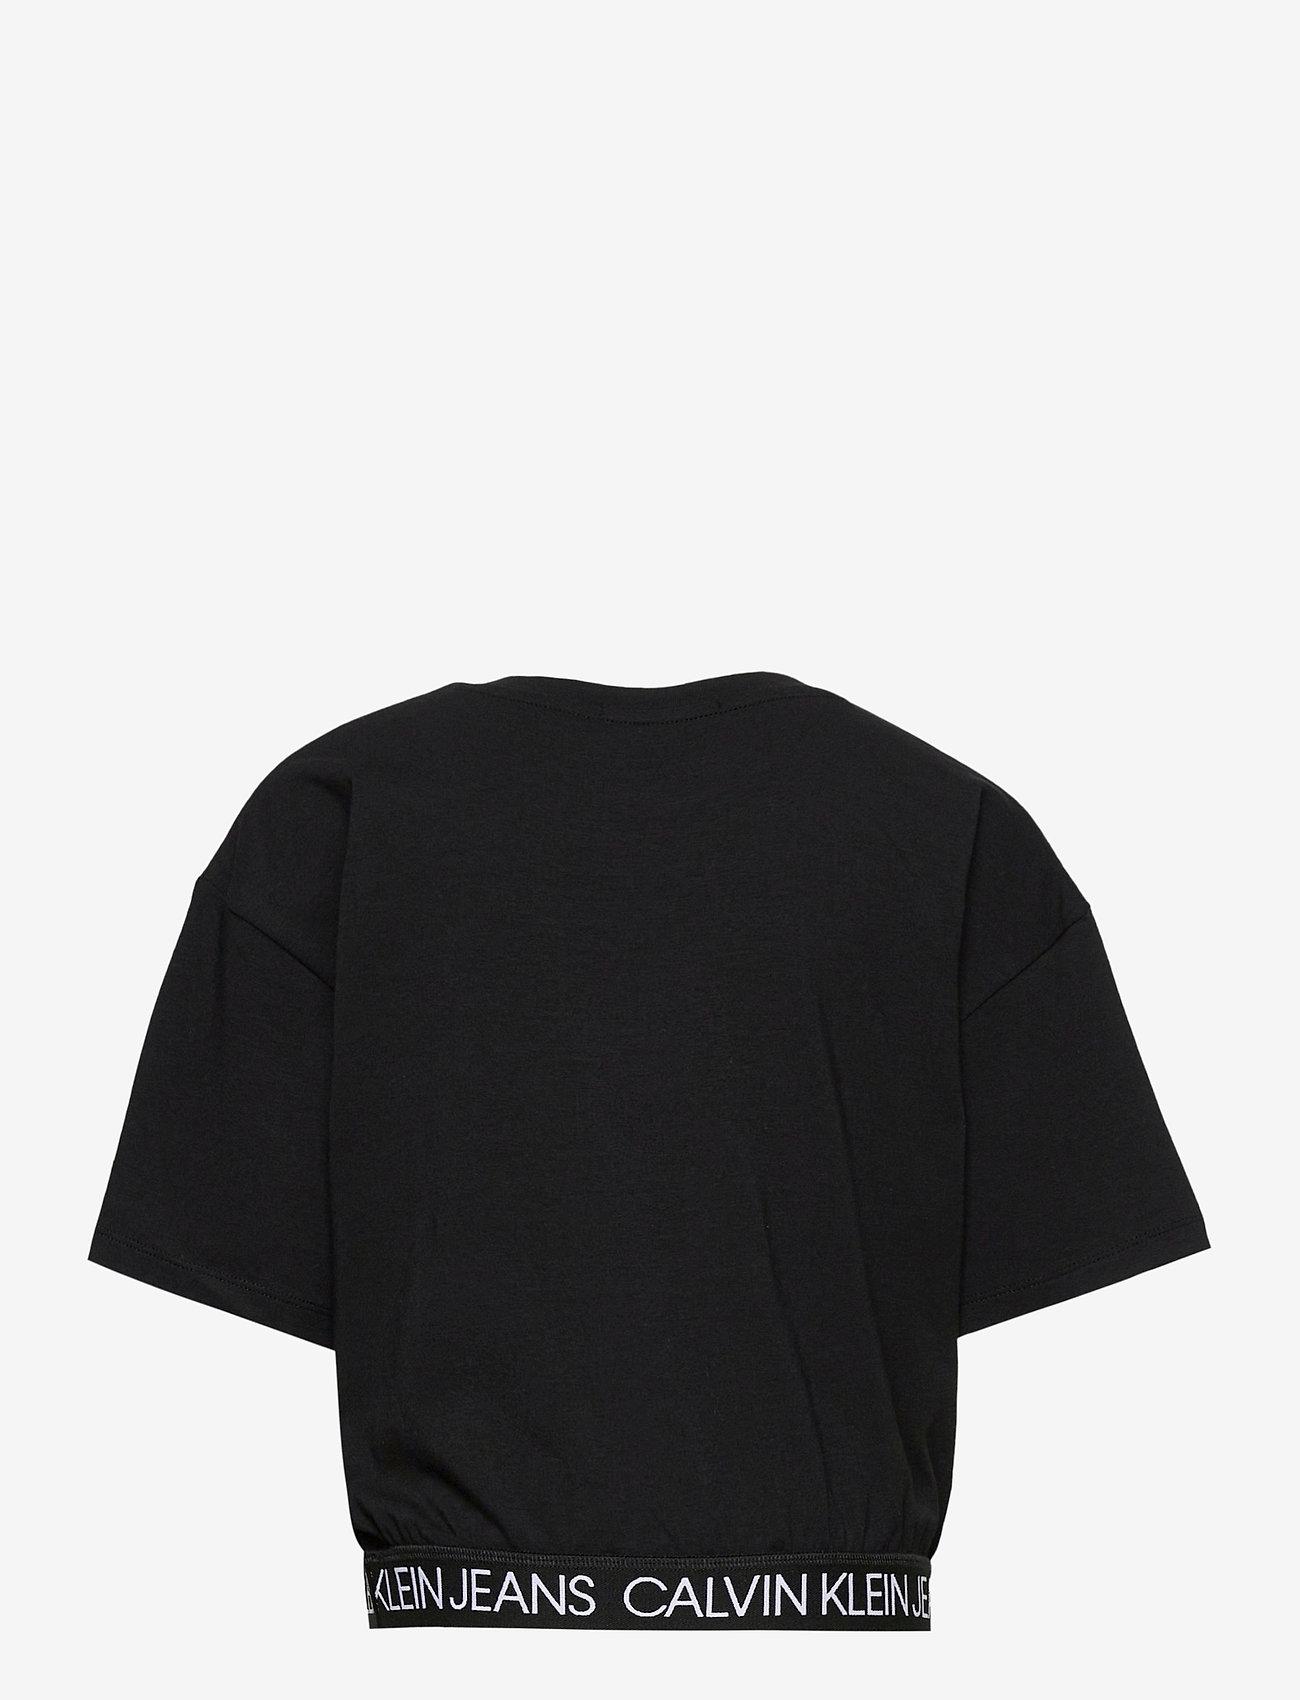 Calvin Klein - LOGO WAISTBAND CROPP - kurzärmelige - ck black - 1